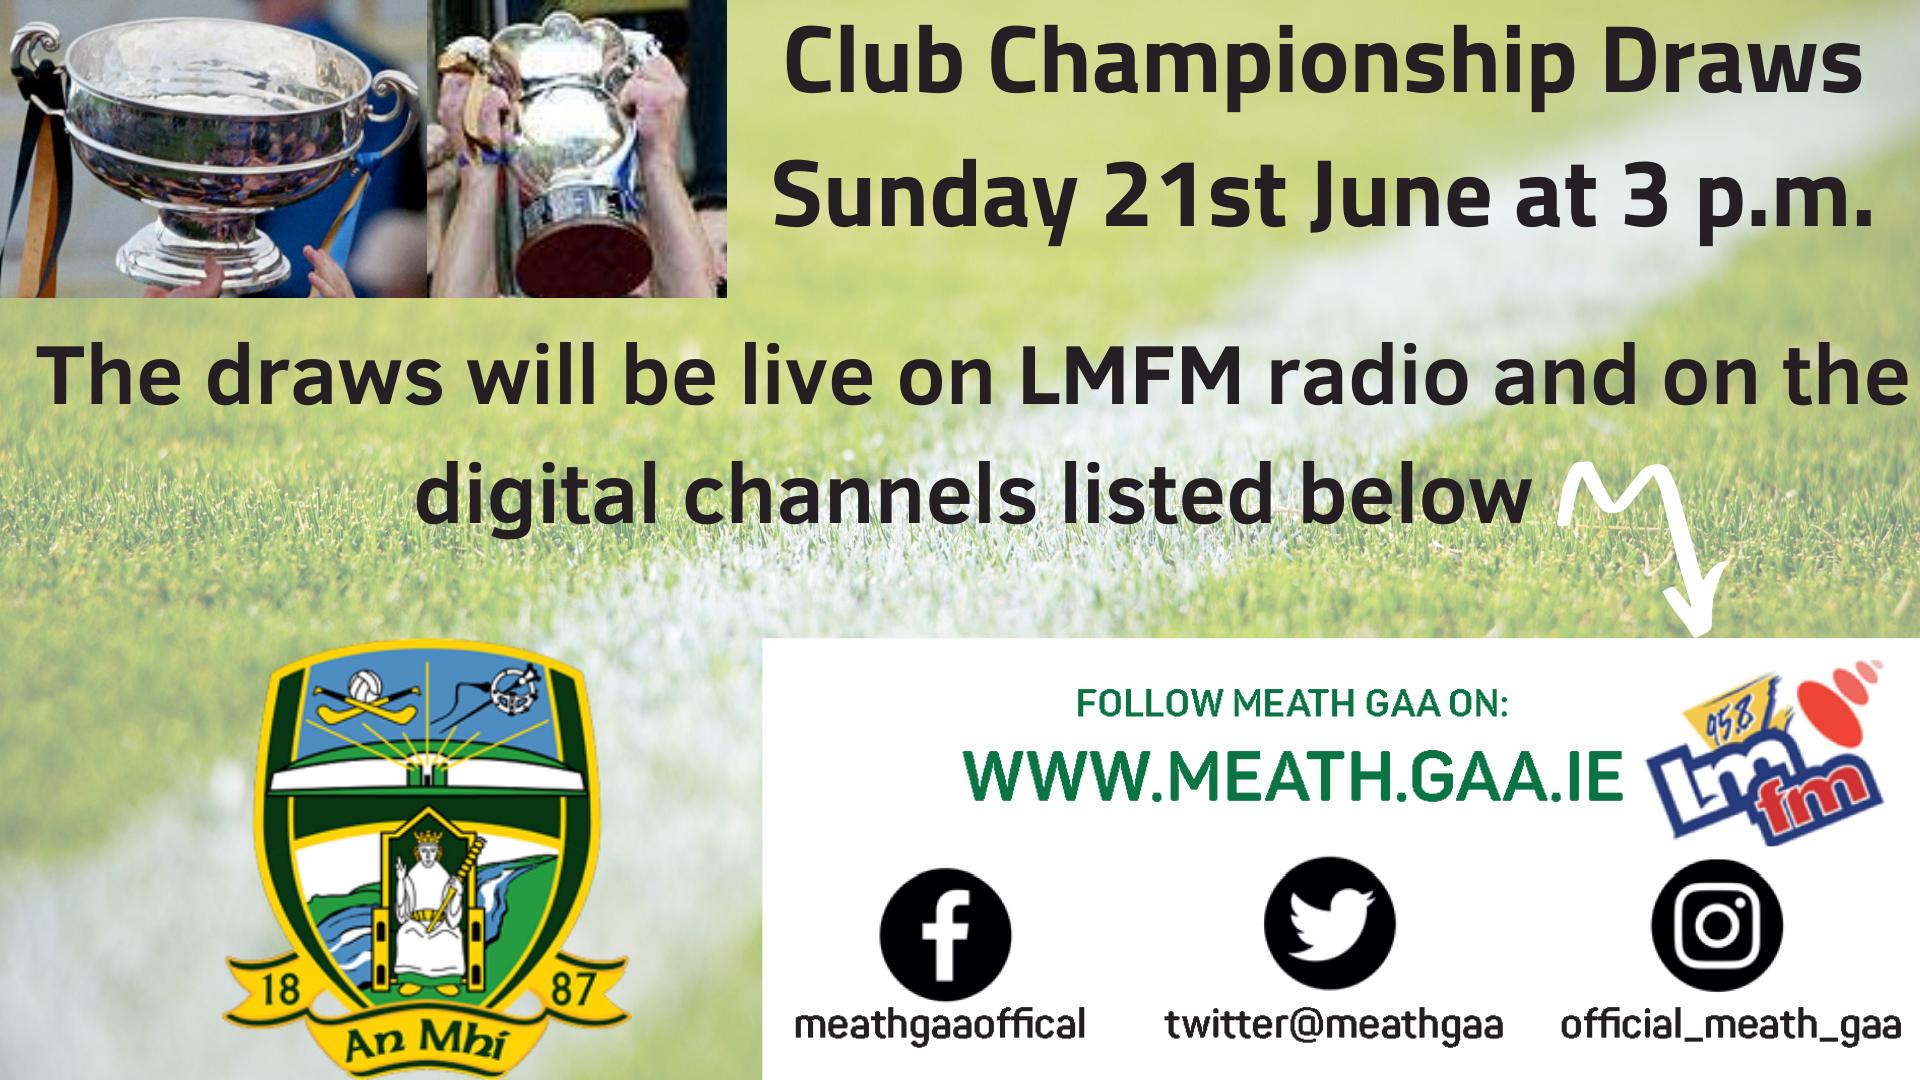 Club Championship Draws Sunday 21st June at 3 p.m.